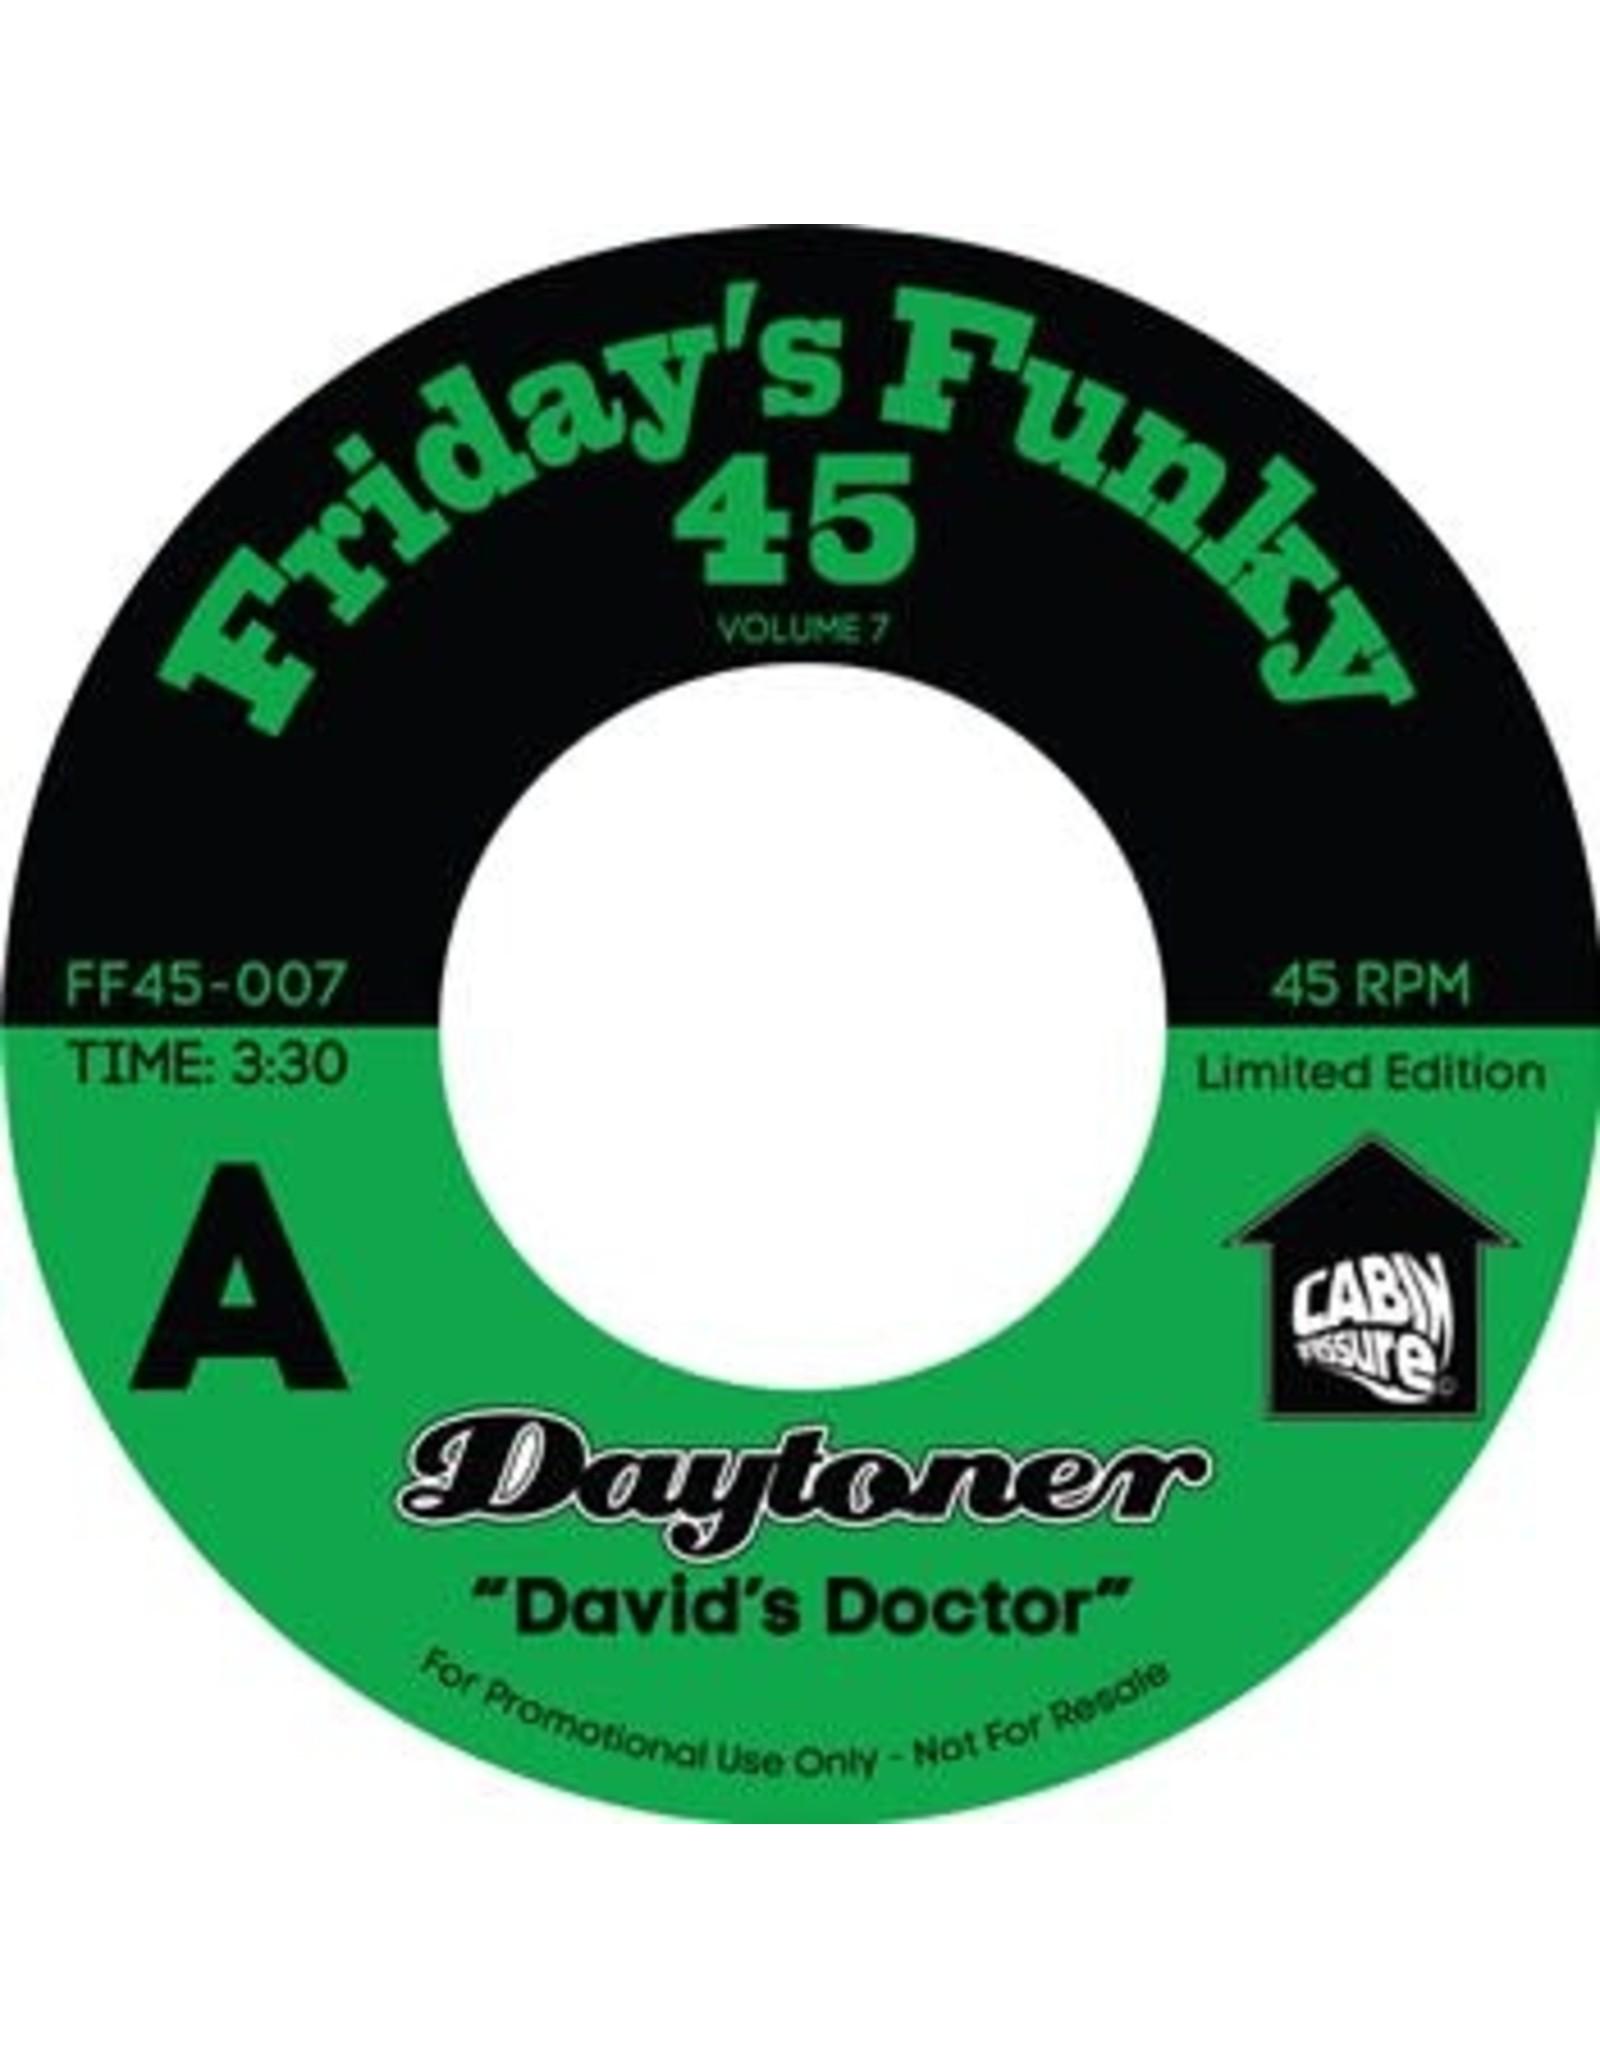 "New Vinyl Daytoner - David's Doctor b/w Ooh Lalo 7"""